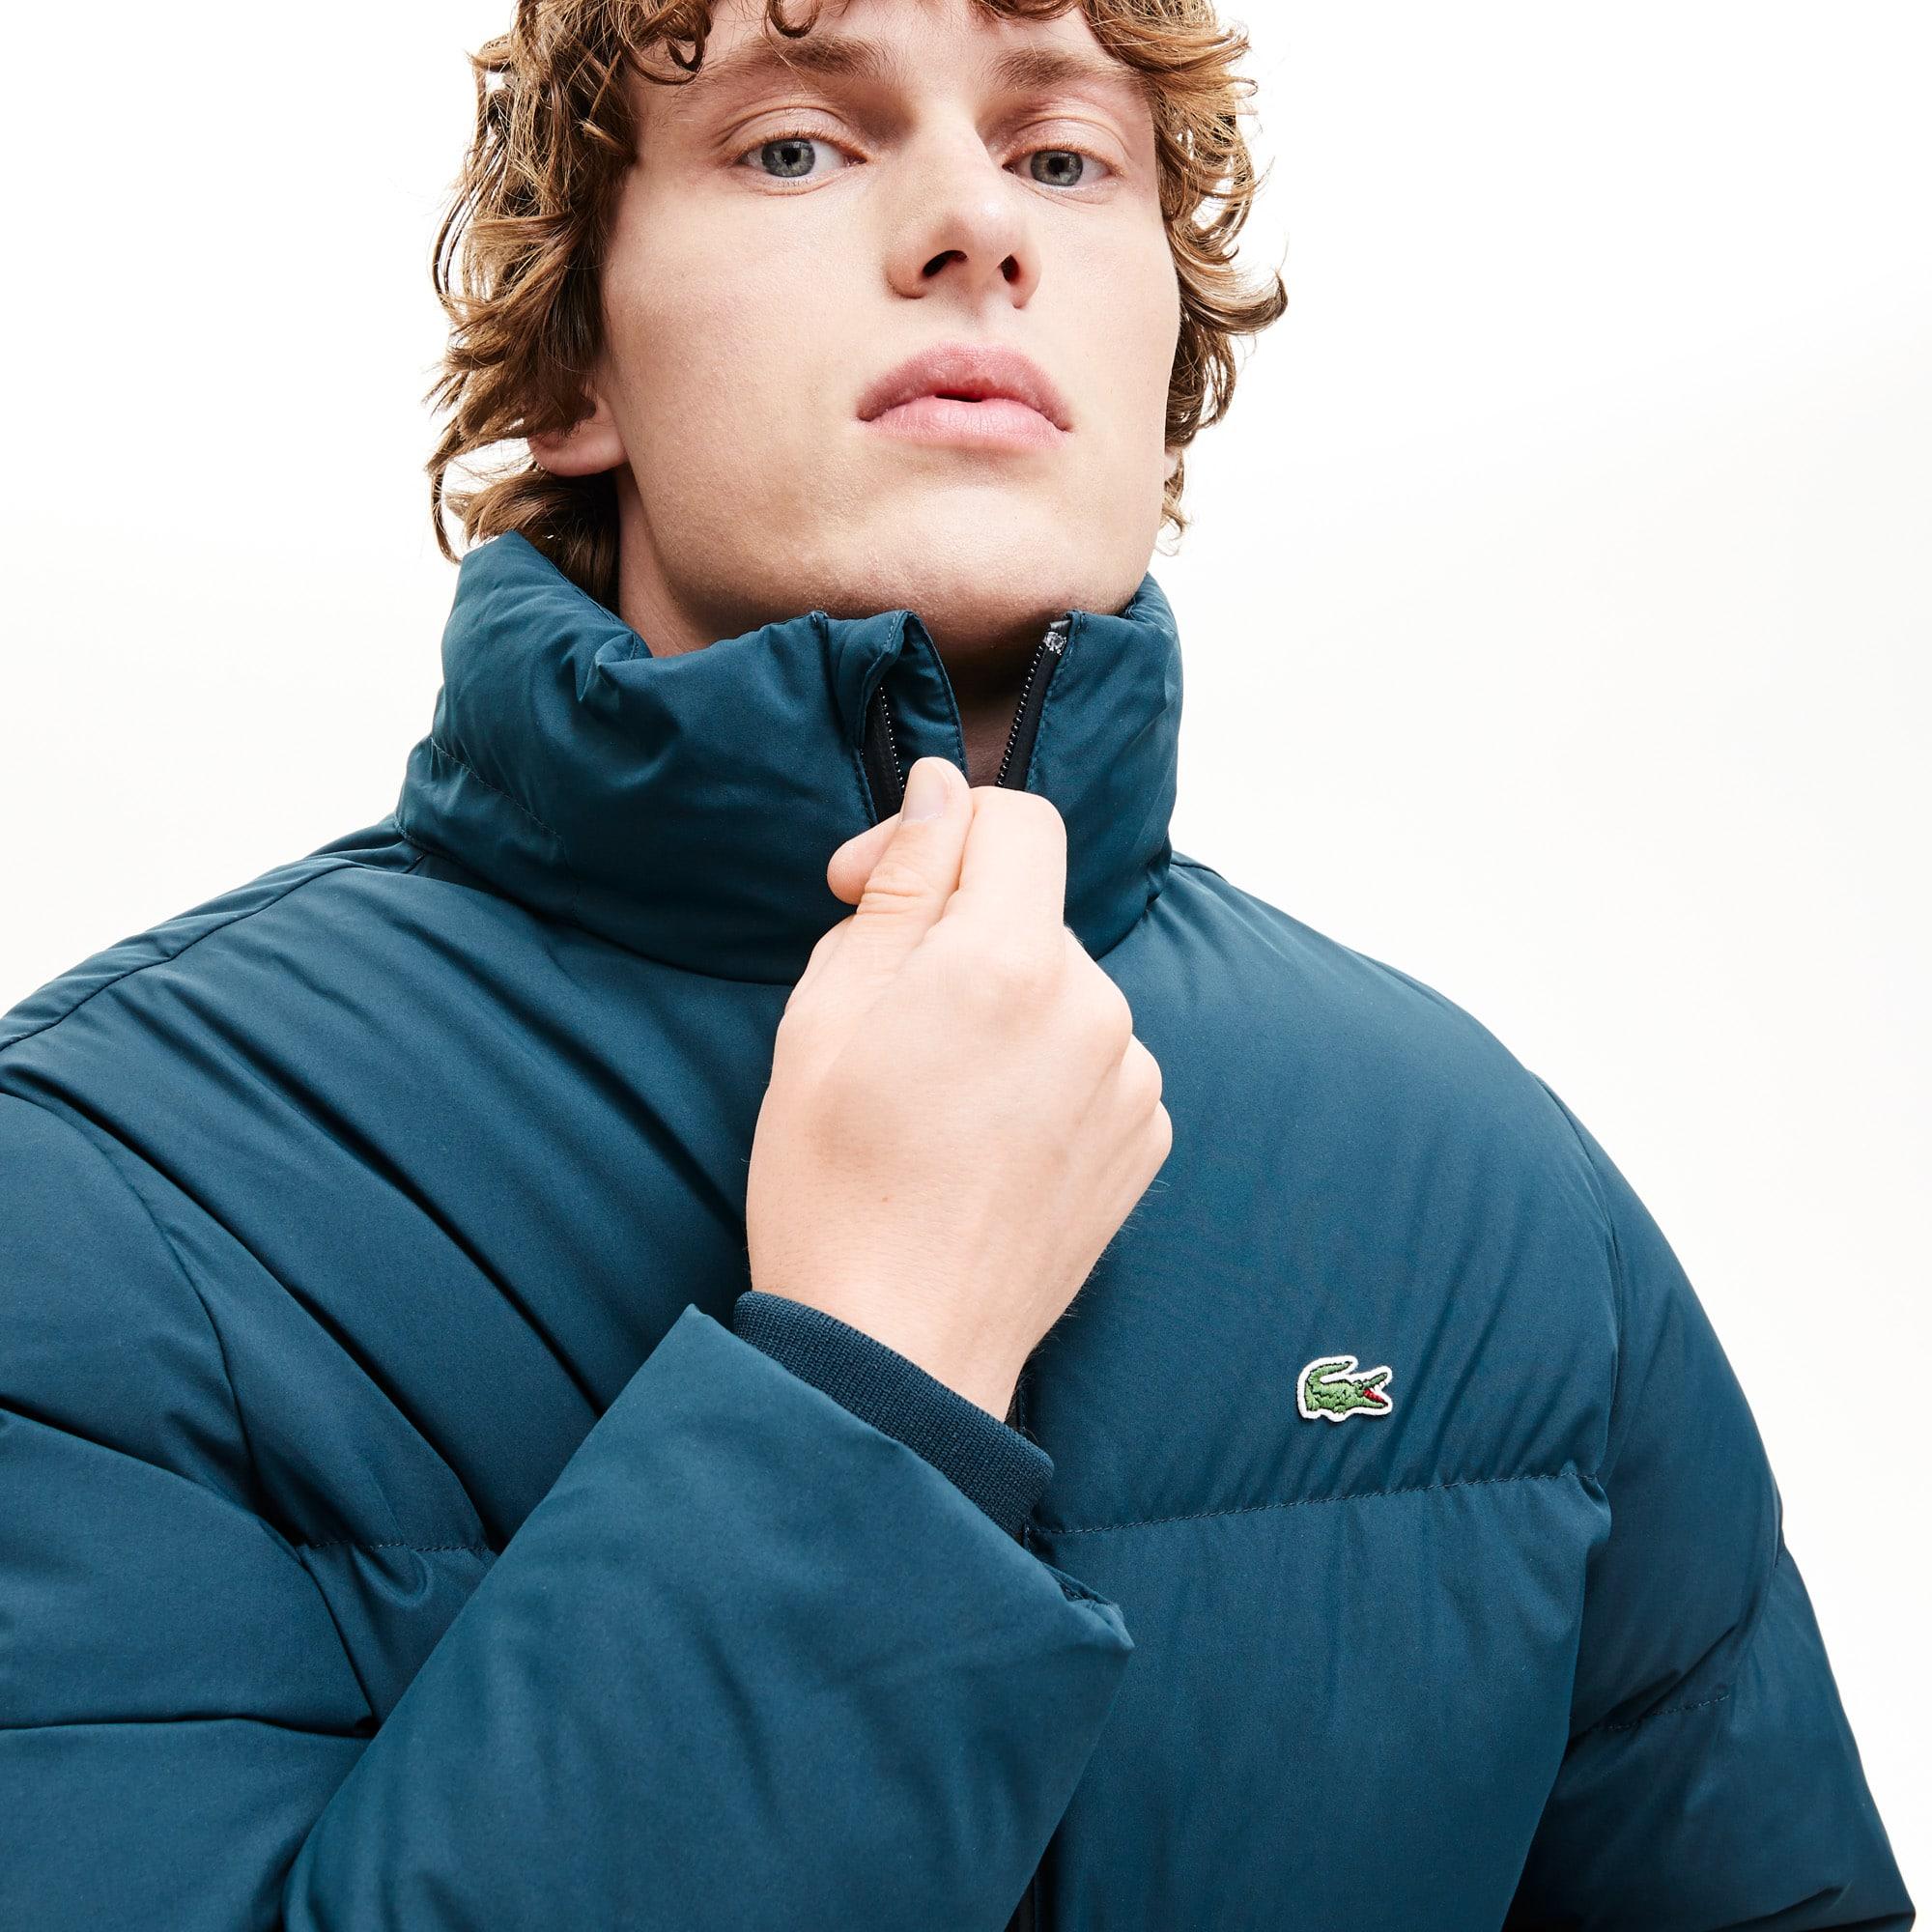 Lacoste Jackets Men's Detachable Hood Quilted Water-Resistant Taffeta Jacket